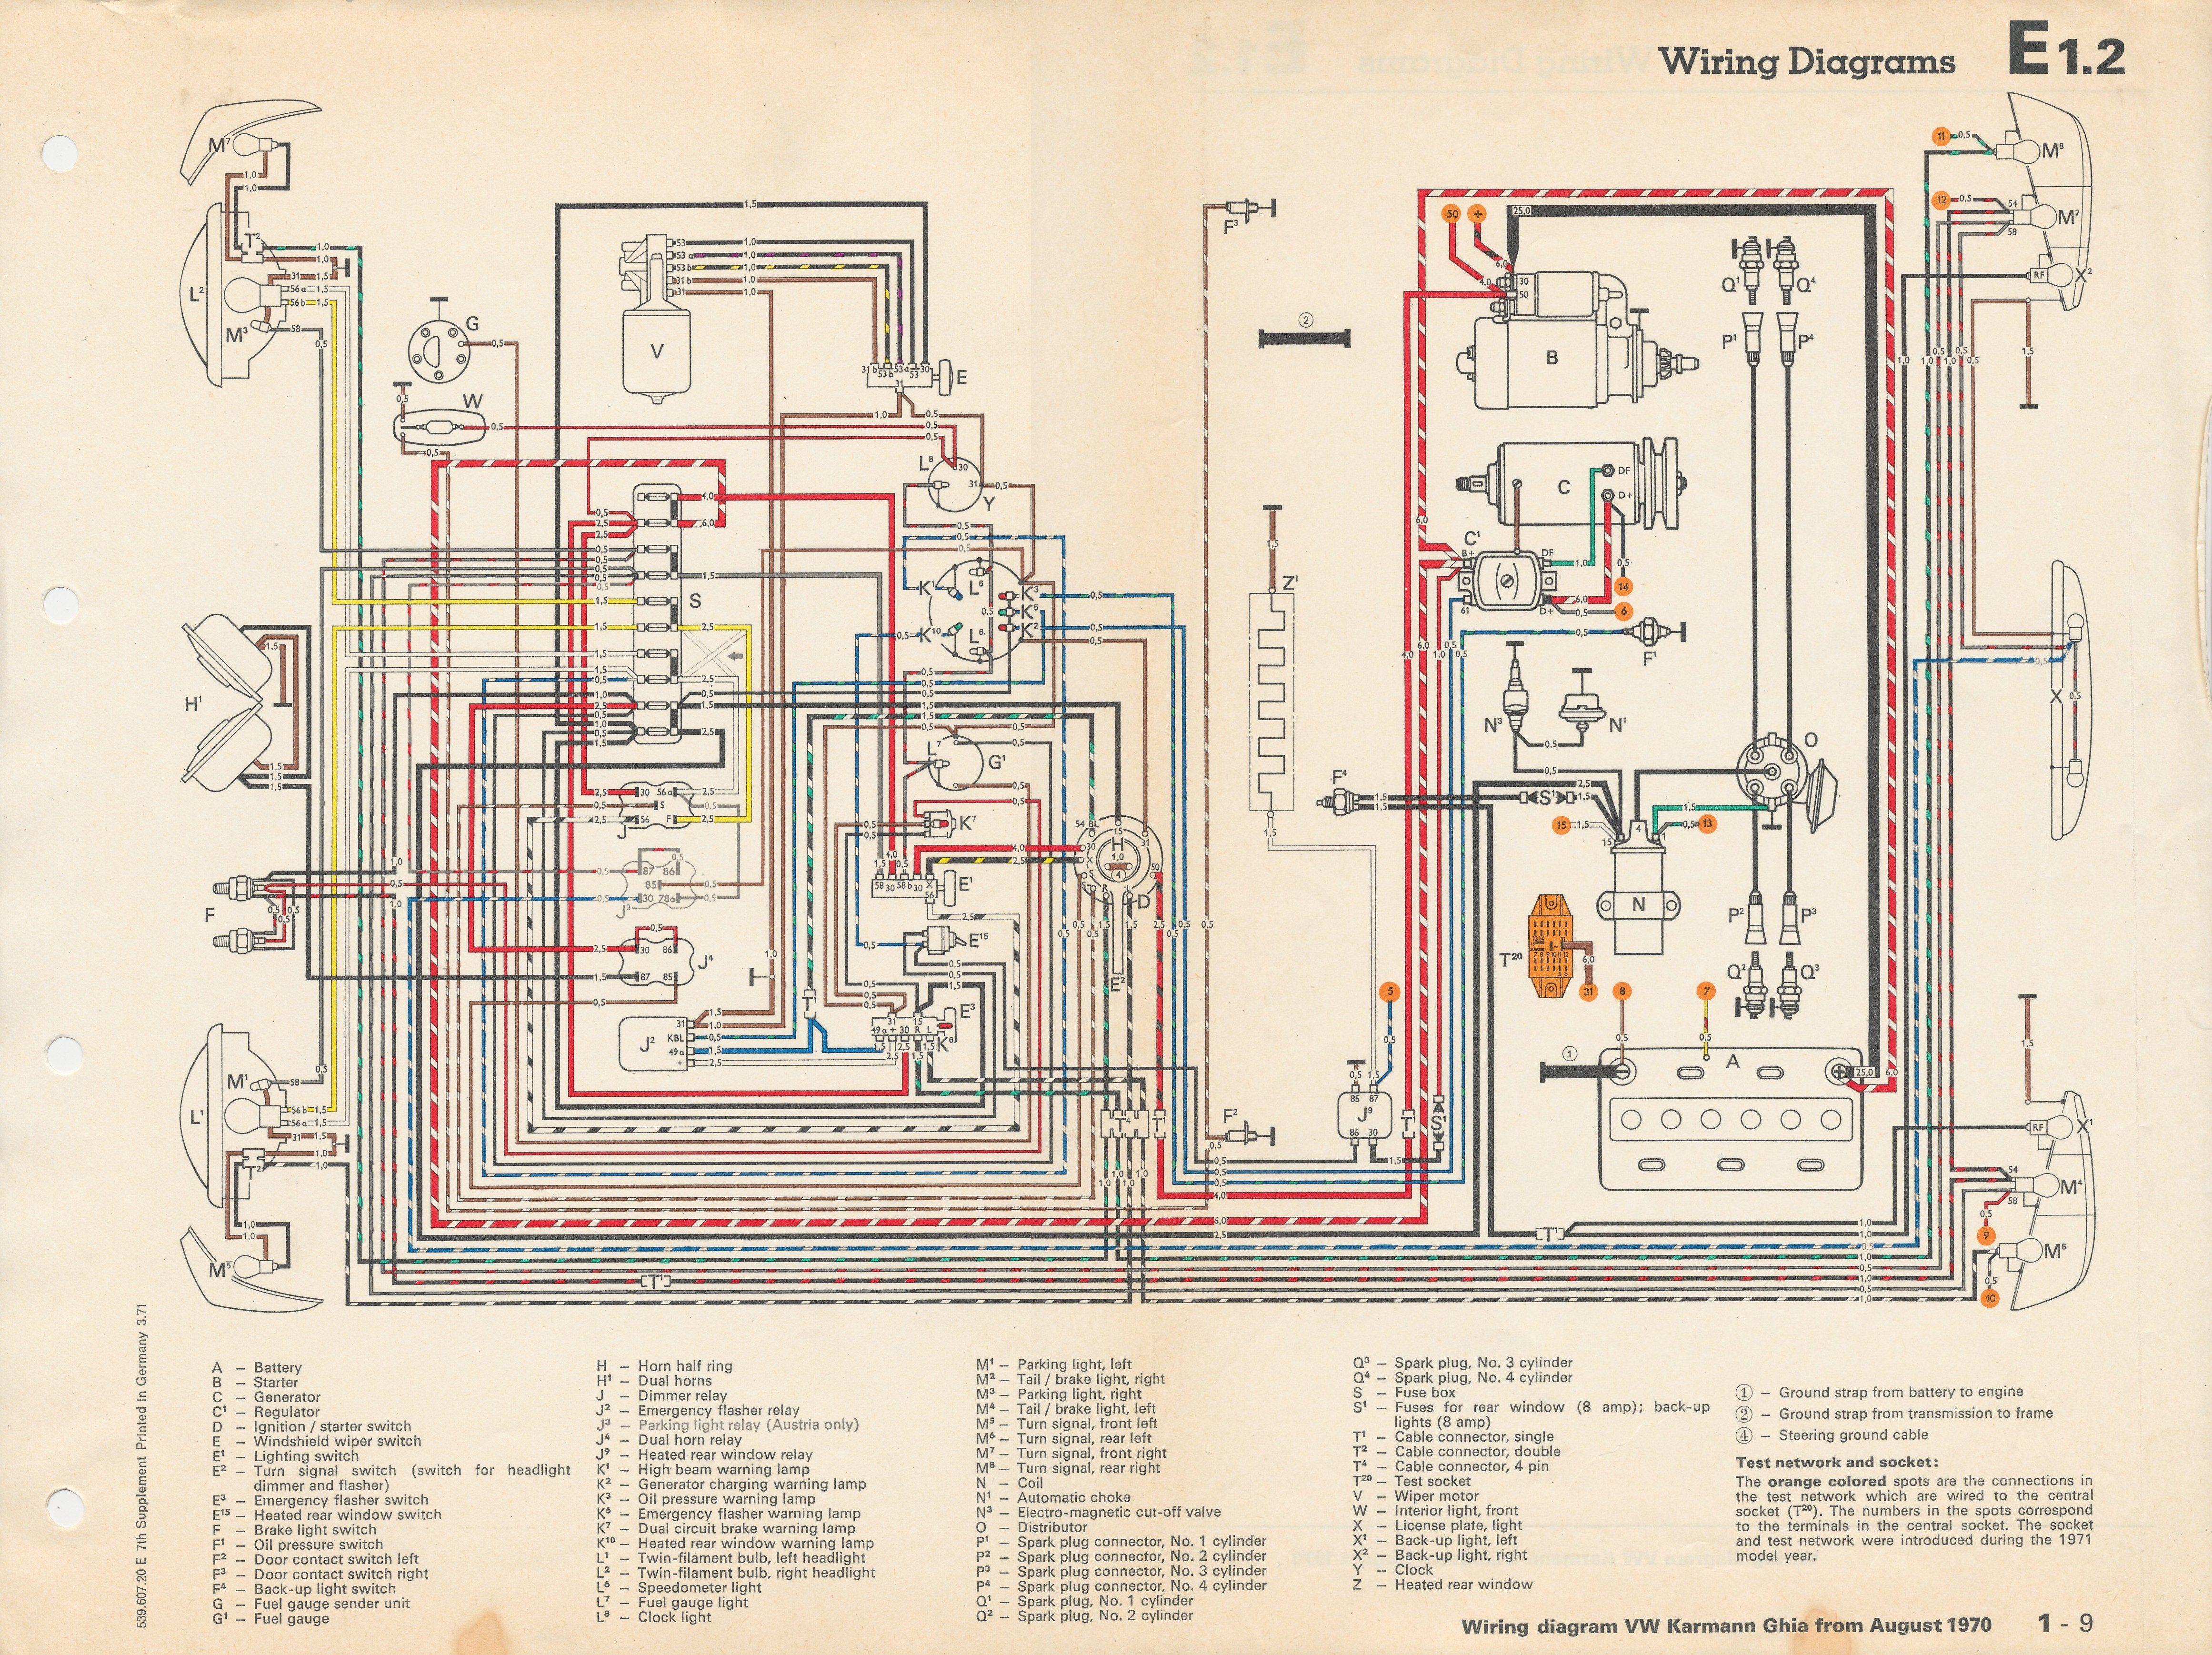 hight resolution of 1971 vw karmann ghia wiring diagram thesamba com karmann ghia rh pinterest com 1969 vw beetle